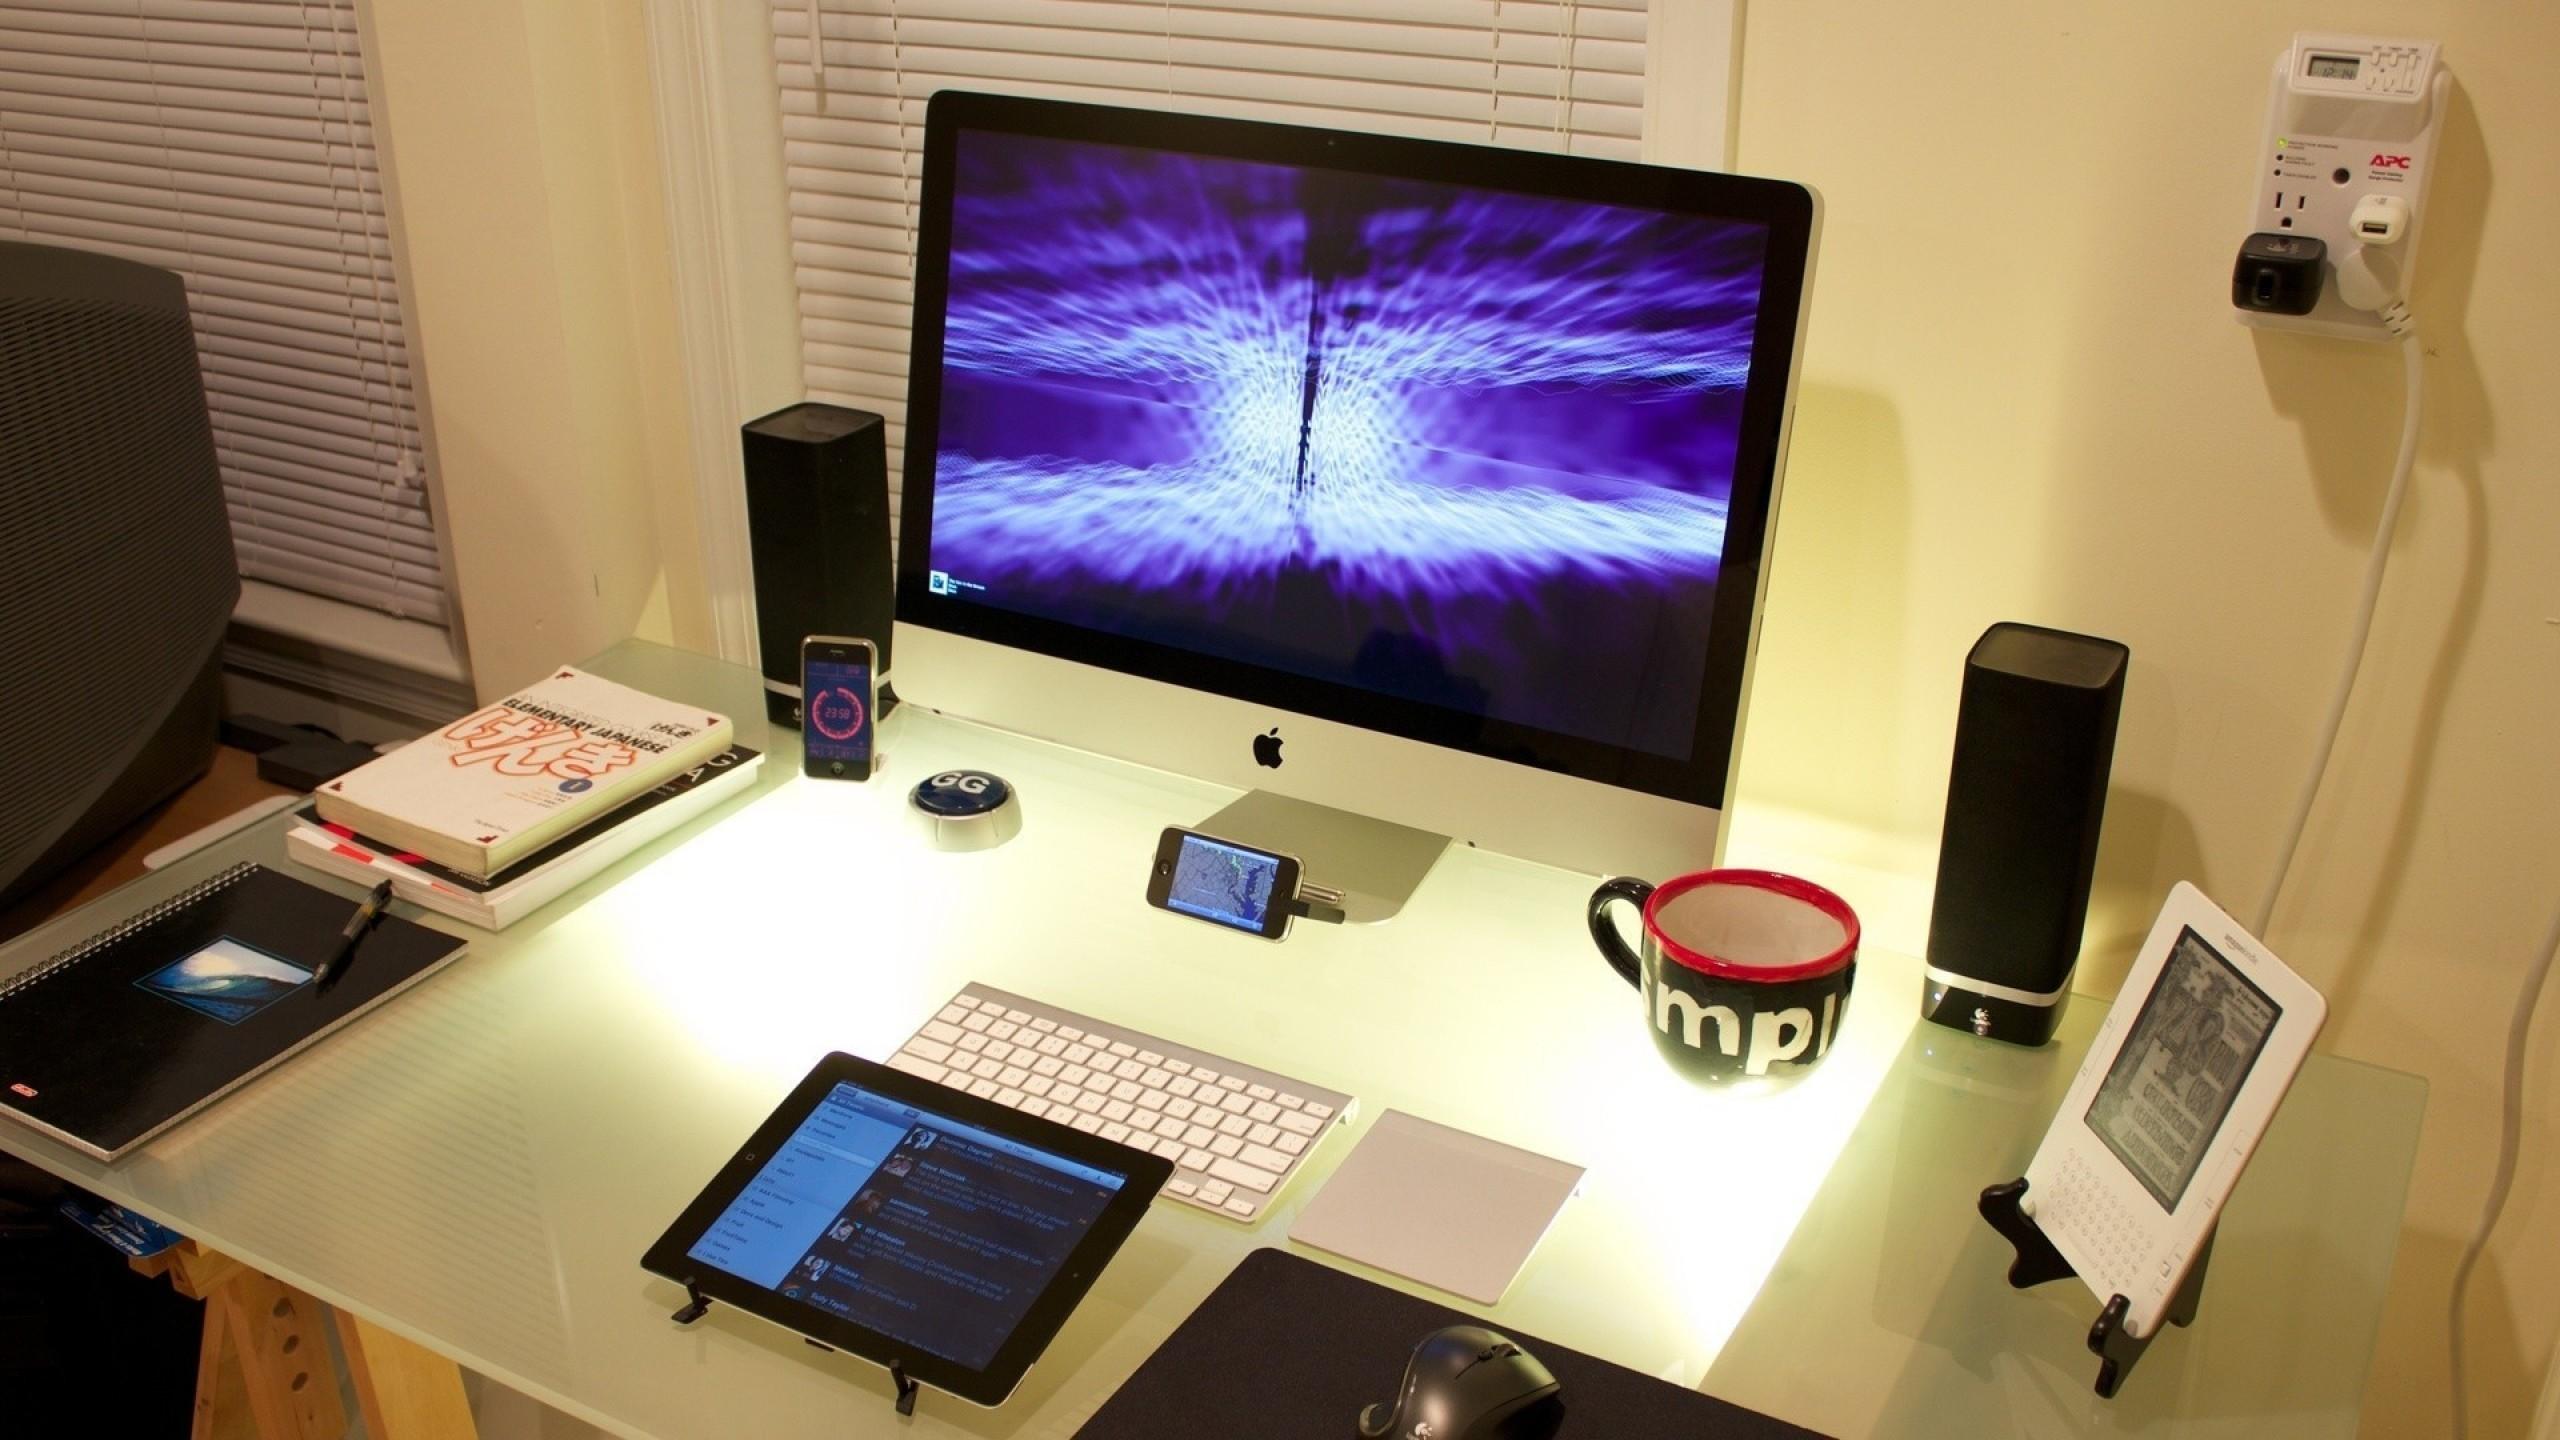 Wallpaper book, phone, gadget, monitor, table, furniture